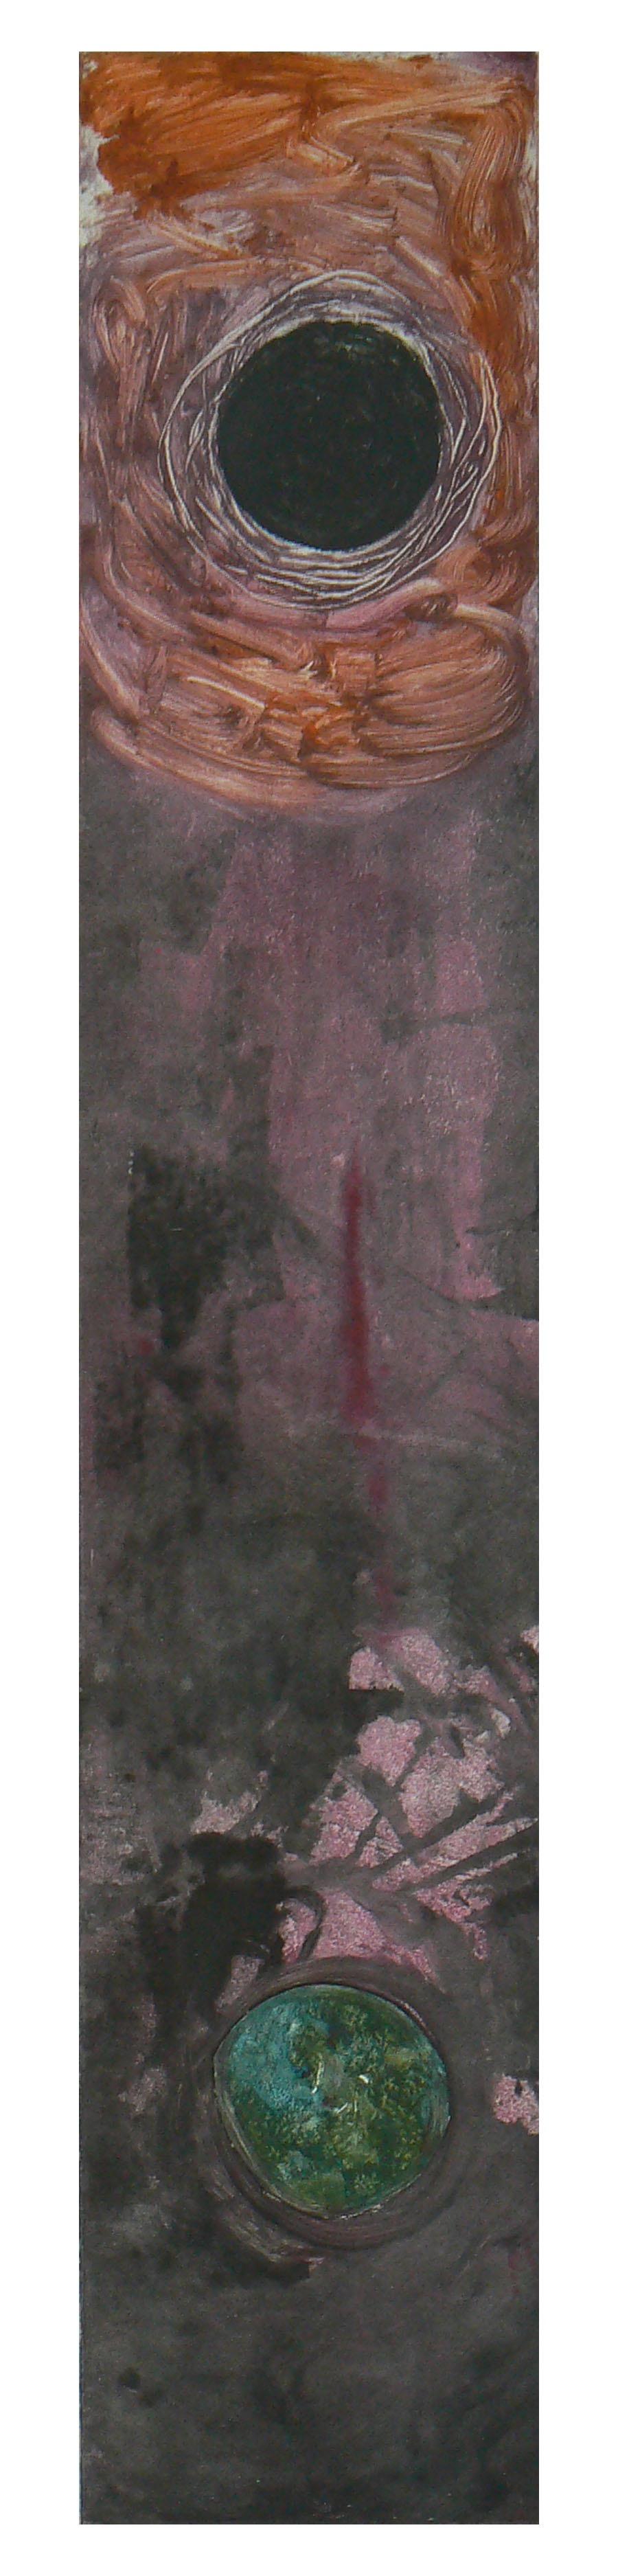 Totem – Interlude